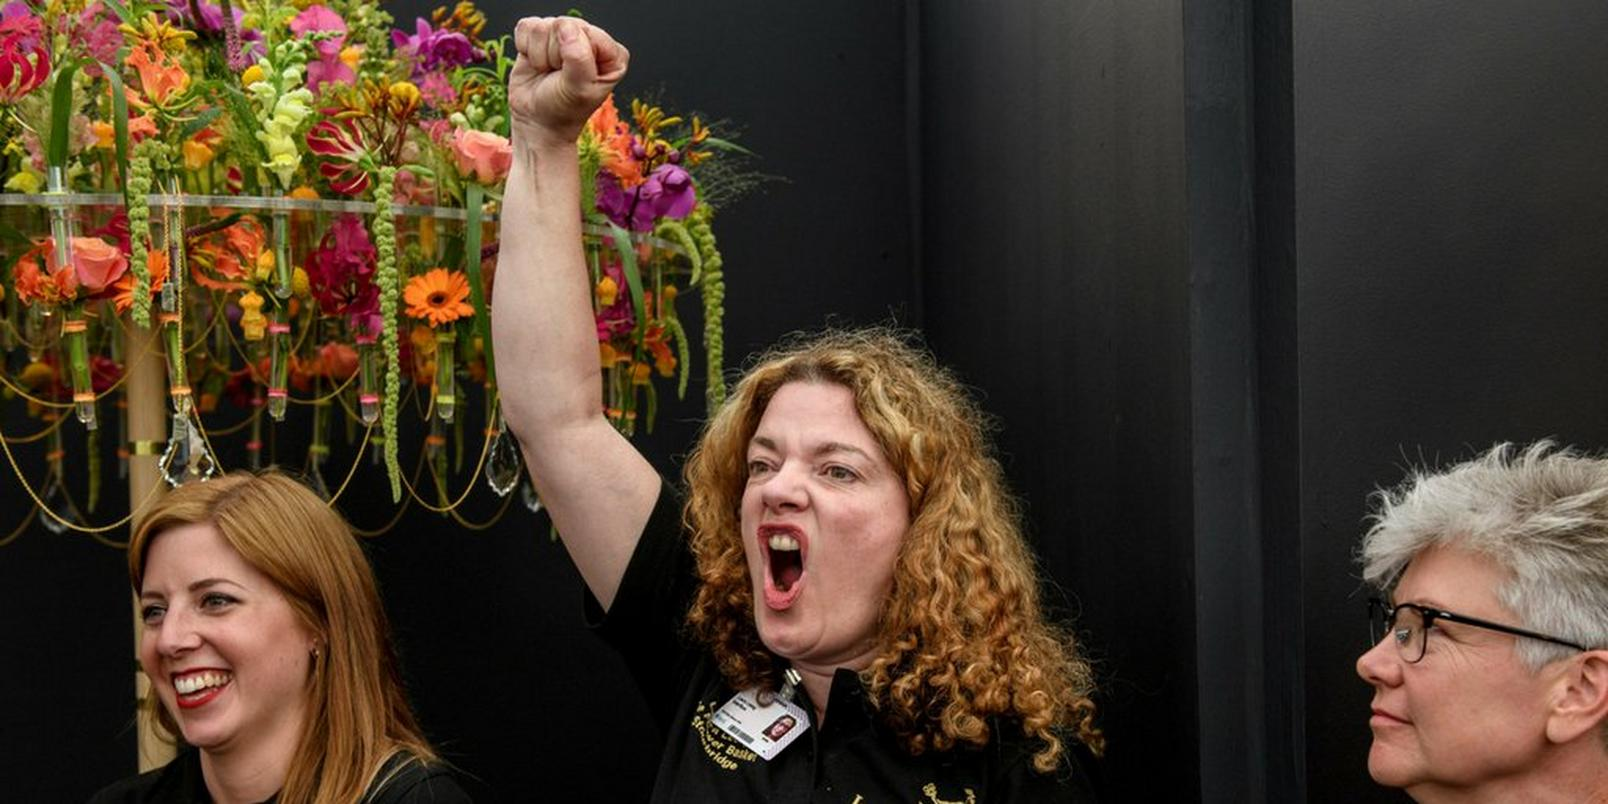 Laura-leong-crowned-interflora-florist-year-2018-3